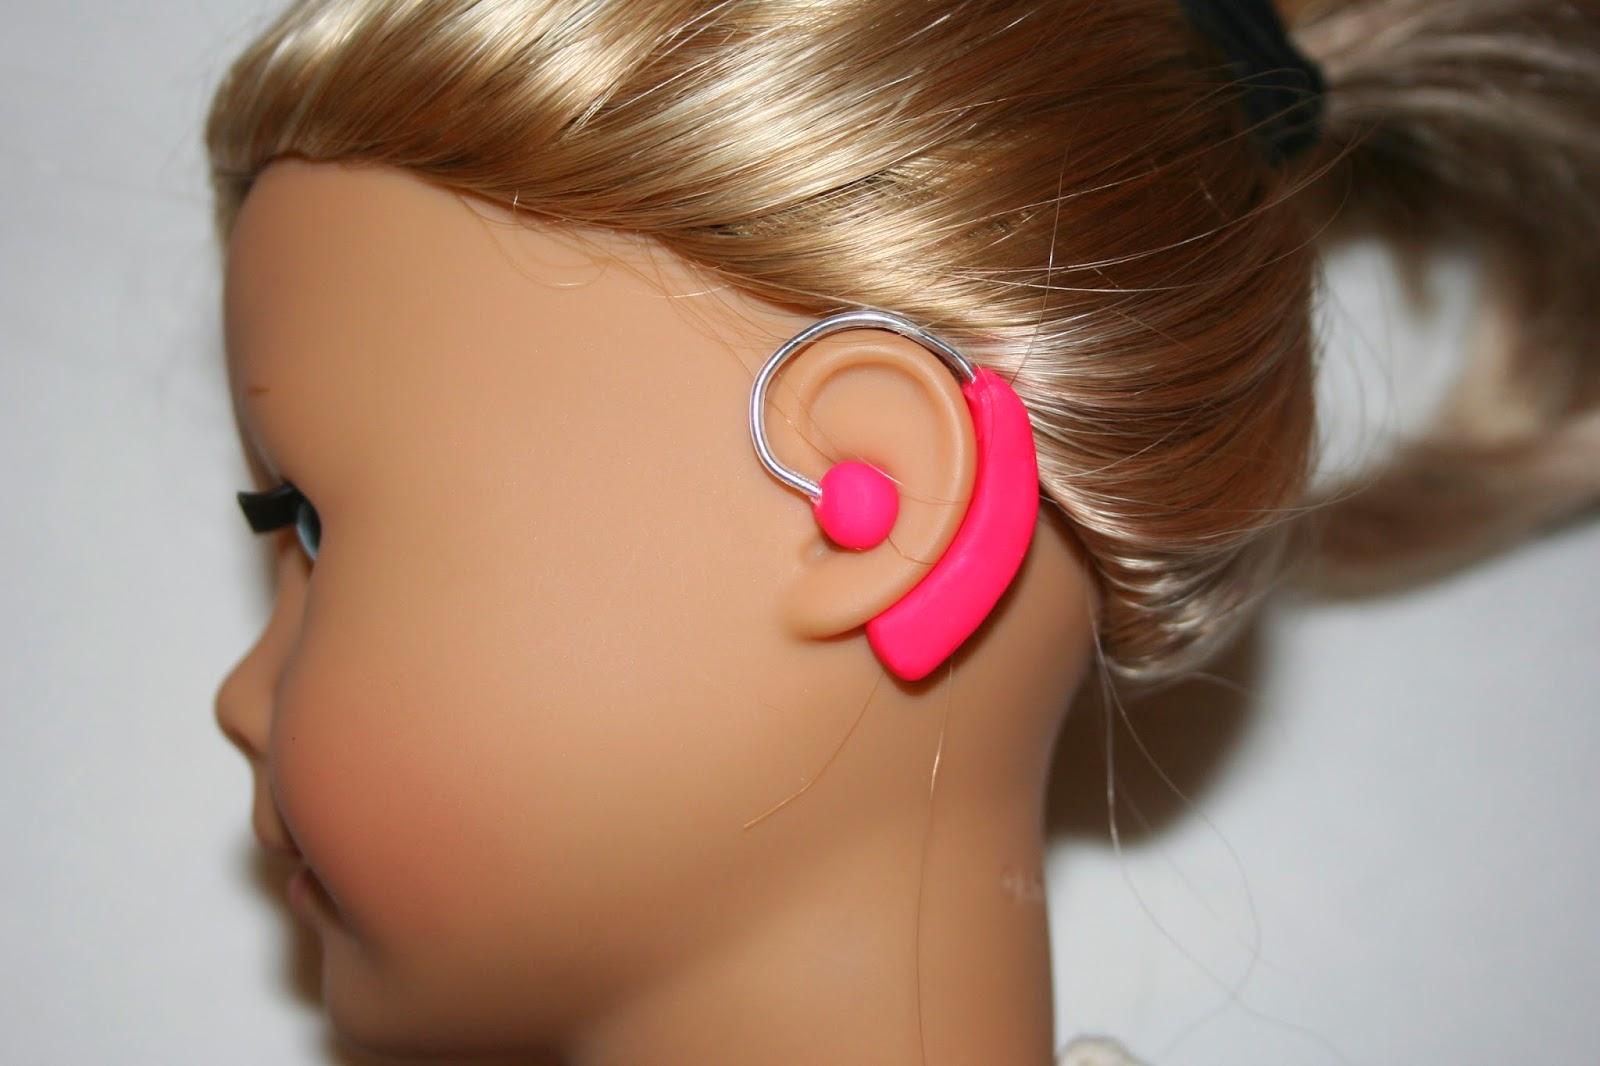 http://myagdollcraft.blogspot.com/2014/01/hearing-aid-for-american-girl-doll.html